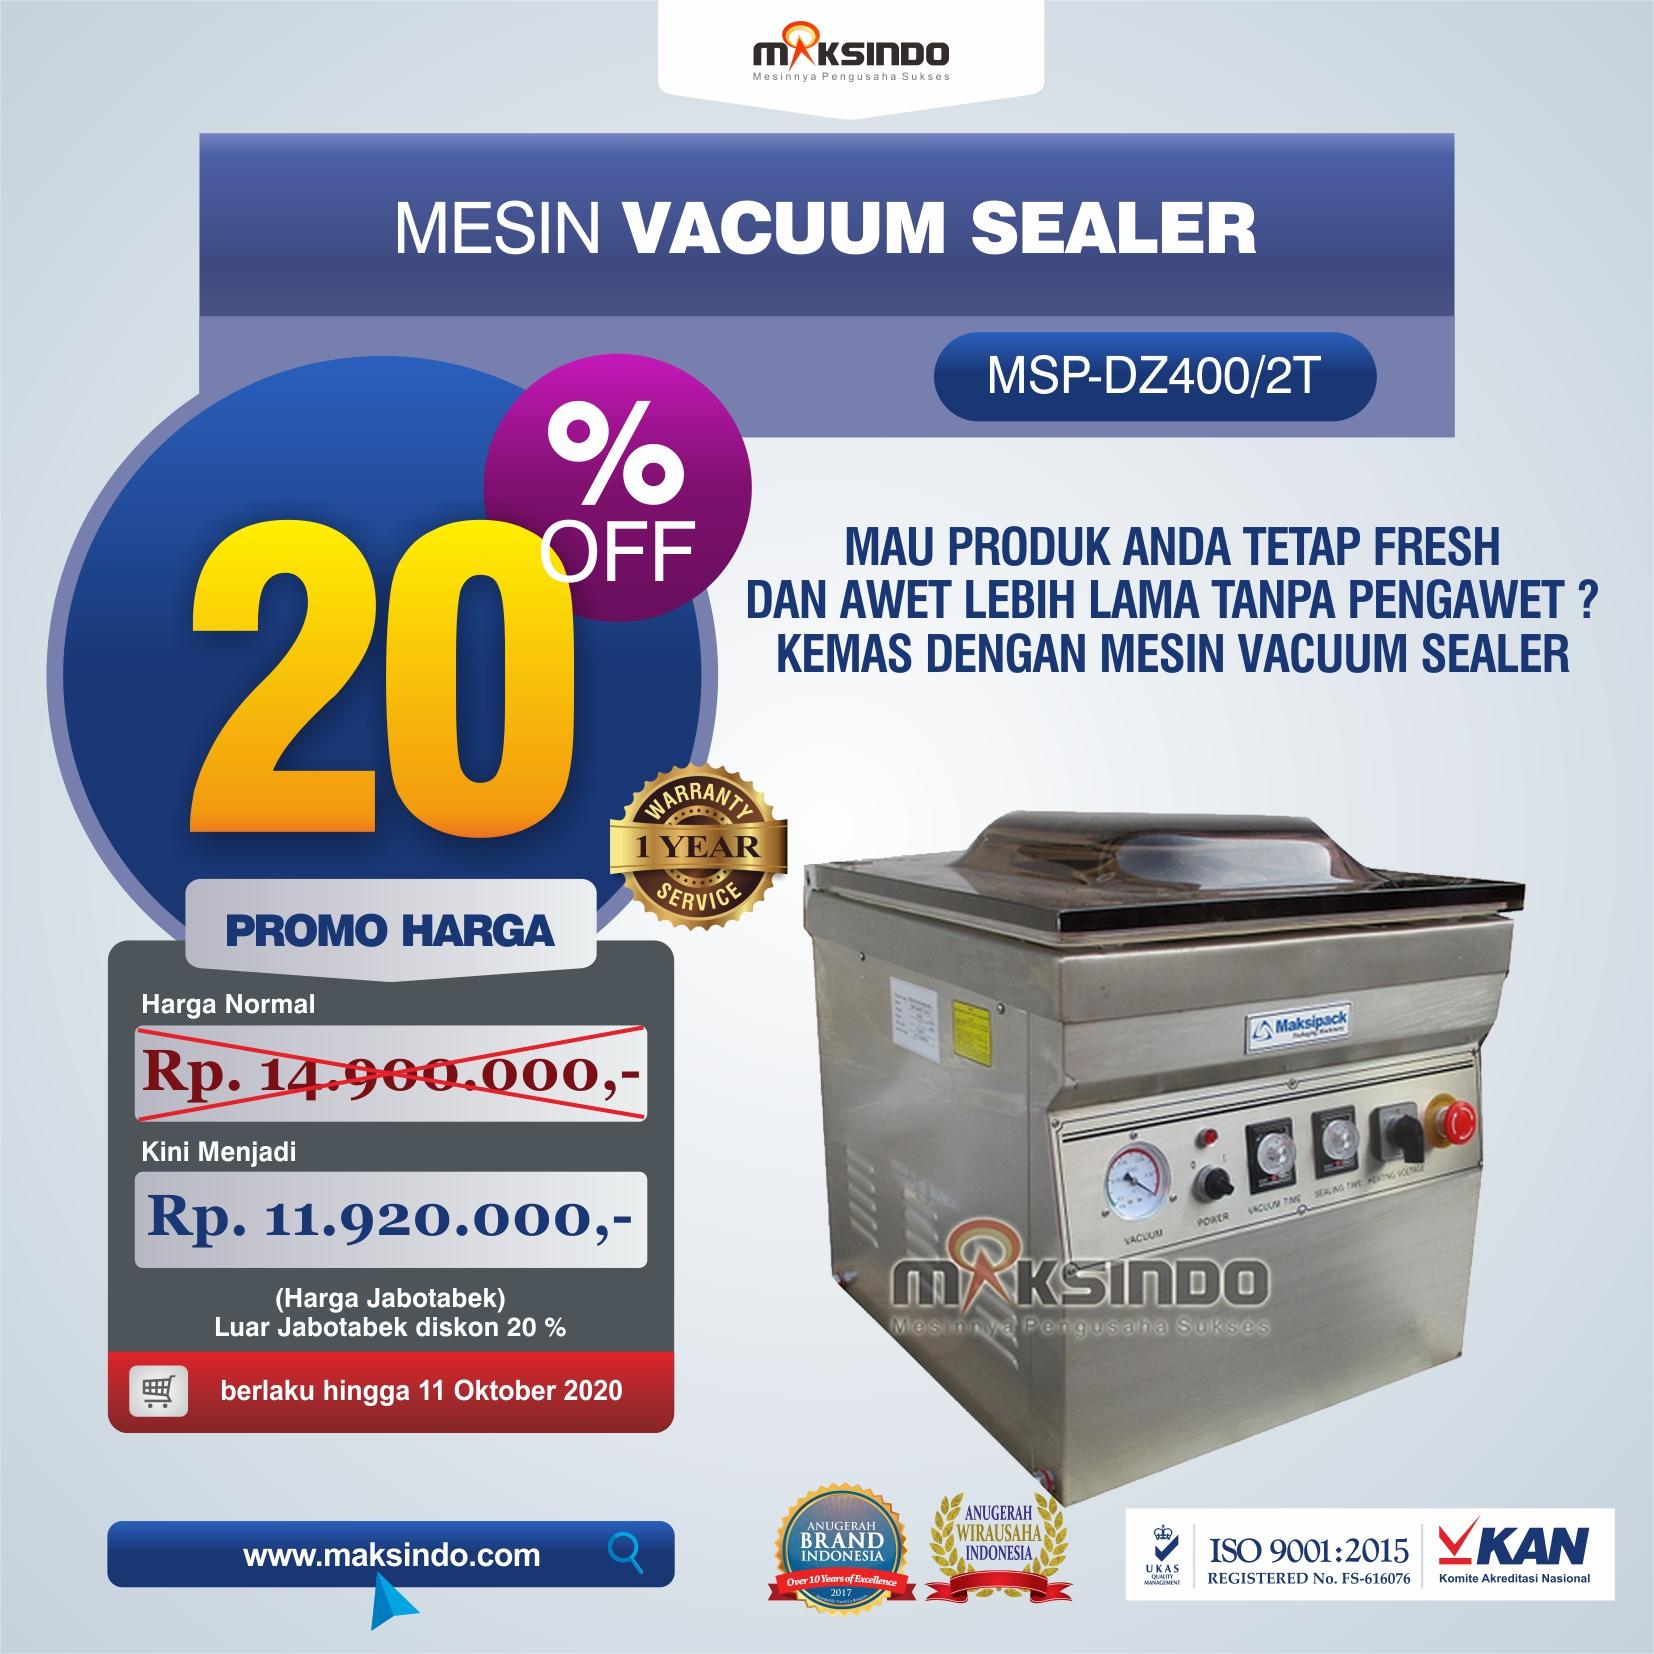 Jual Vacuum Sealer MSP-DZ400/2T Di Malang